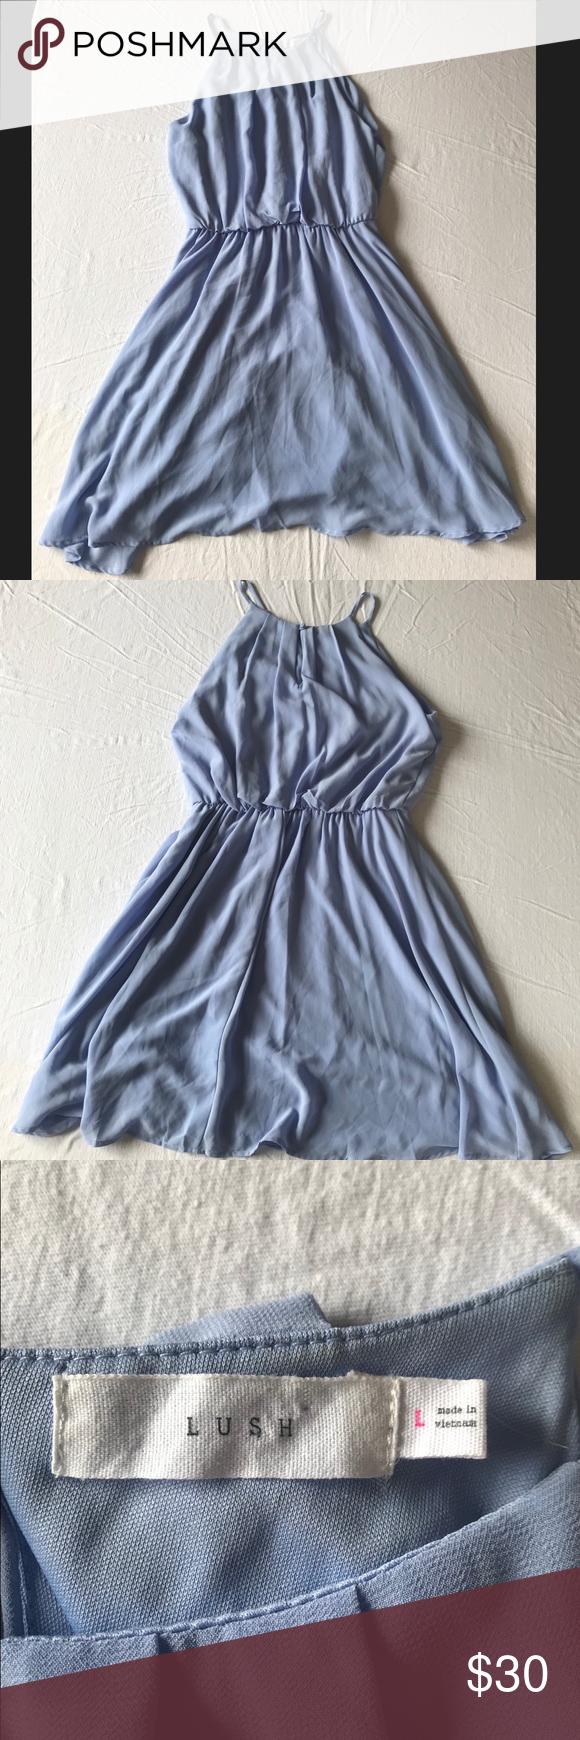 a12ff97500760 Lush Blue Chiffon Skater Dress Size L Great Condition Lush Dresses Midi